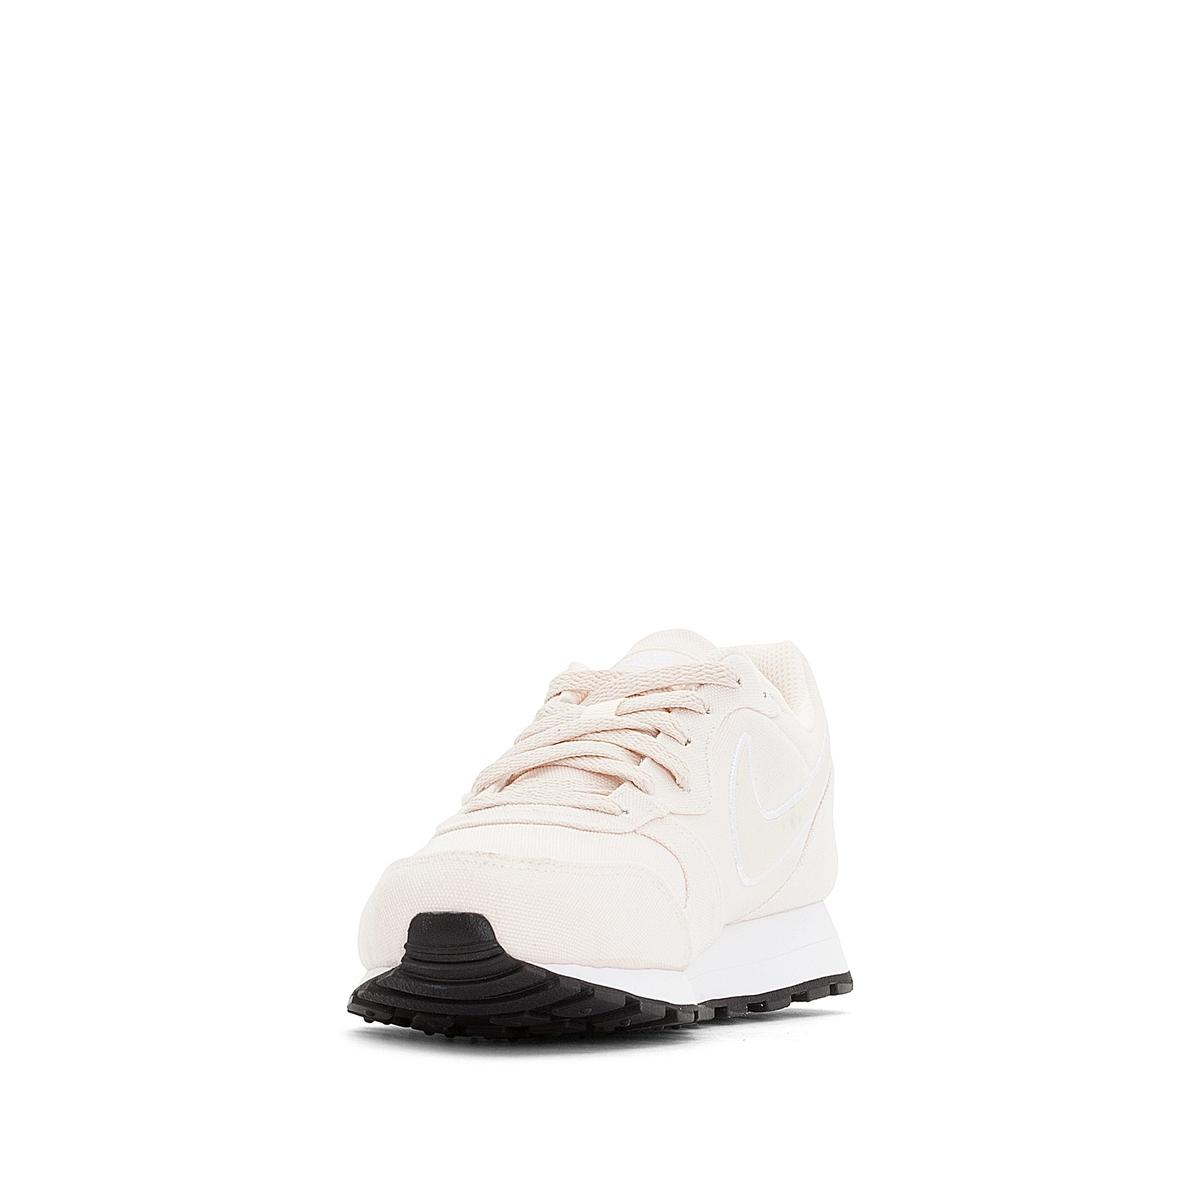 Imagen secundaria de producto de Zapatillas MD Runner 2 SE - Nike